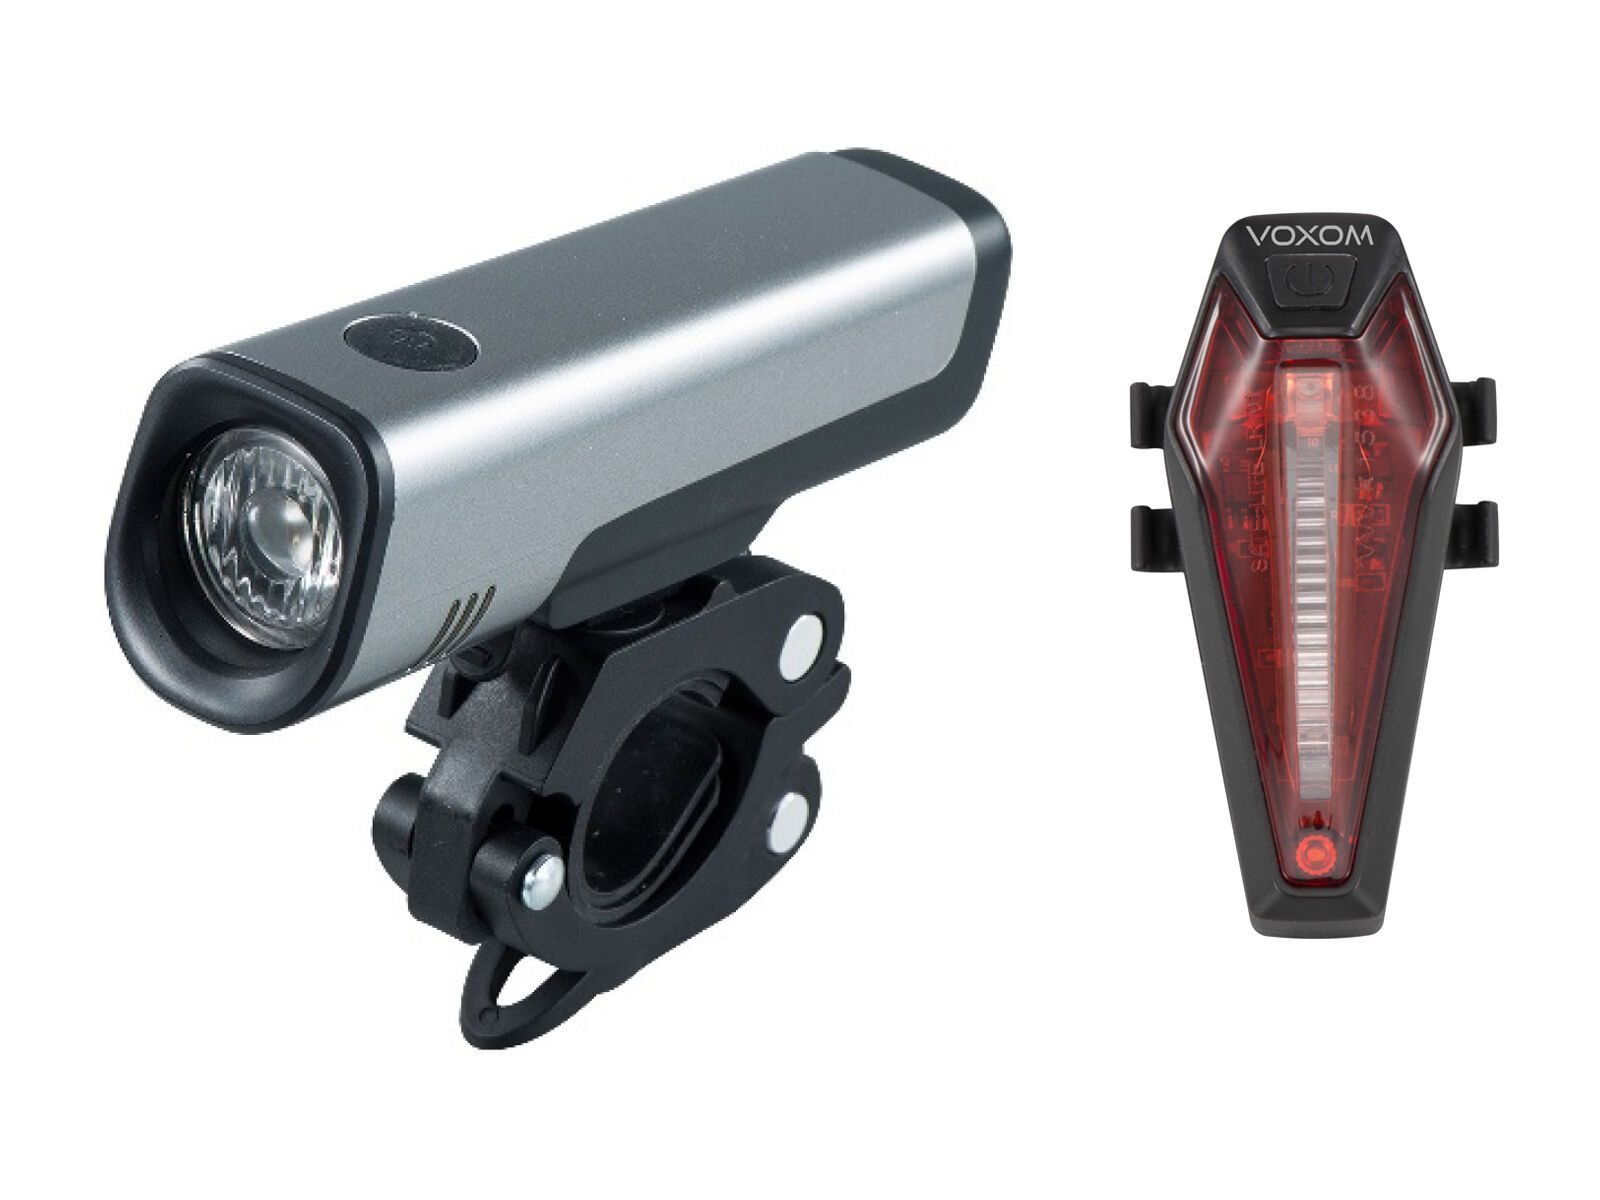 Voxom Fahrradbeleuchtung Set Lv11/Lh7 720000030